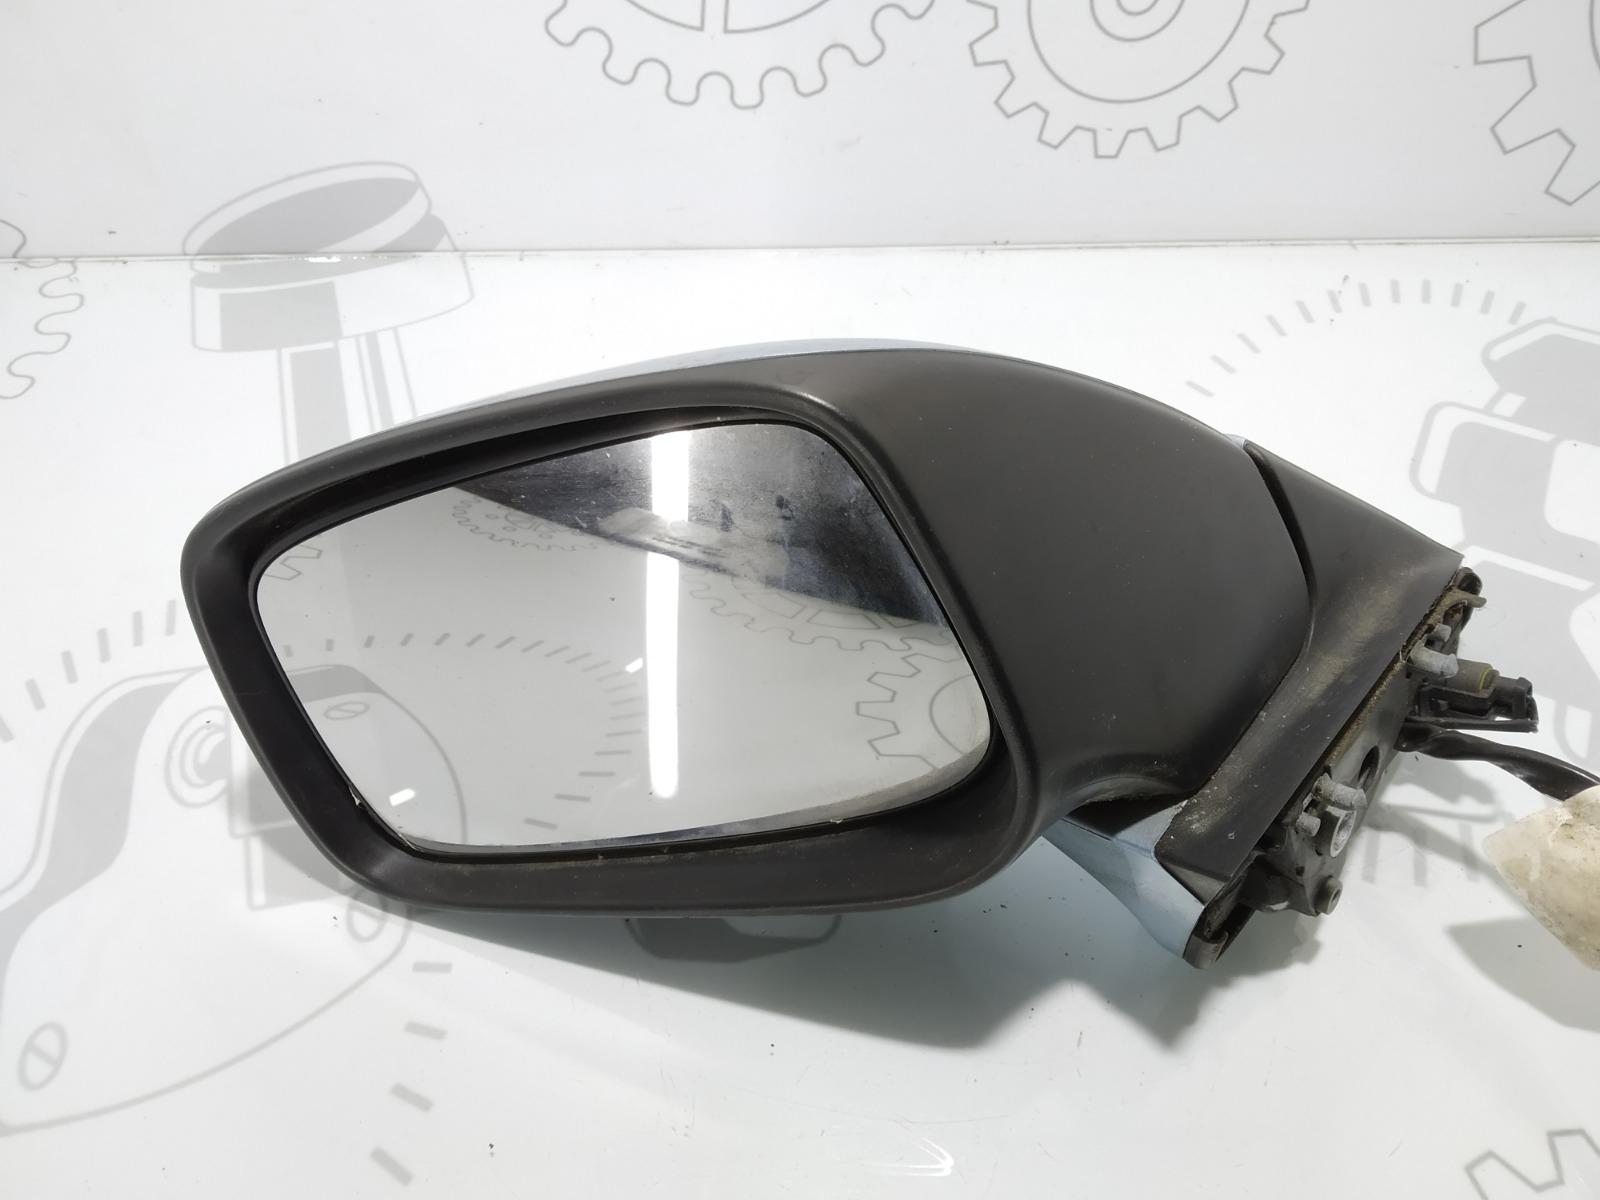 Зеркало наружное левое Fiat Ulysse 2.0 I 2005 (б/у)